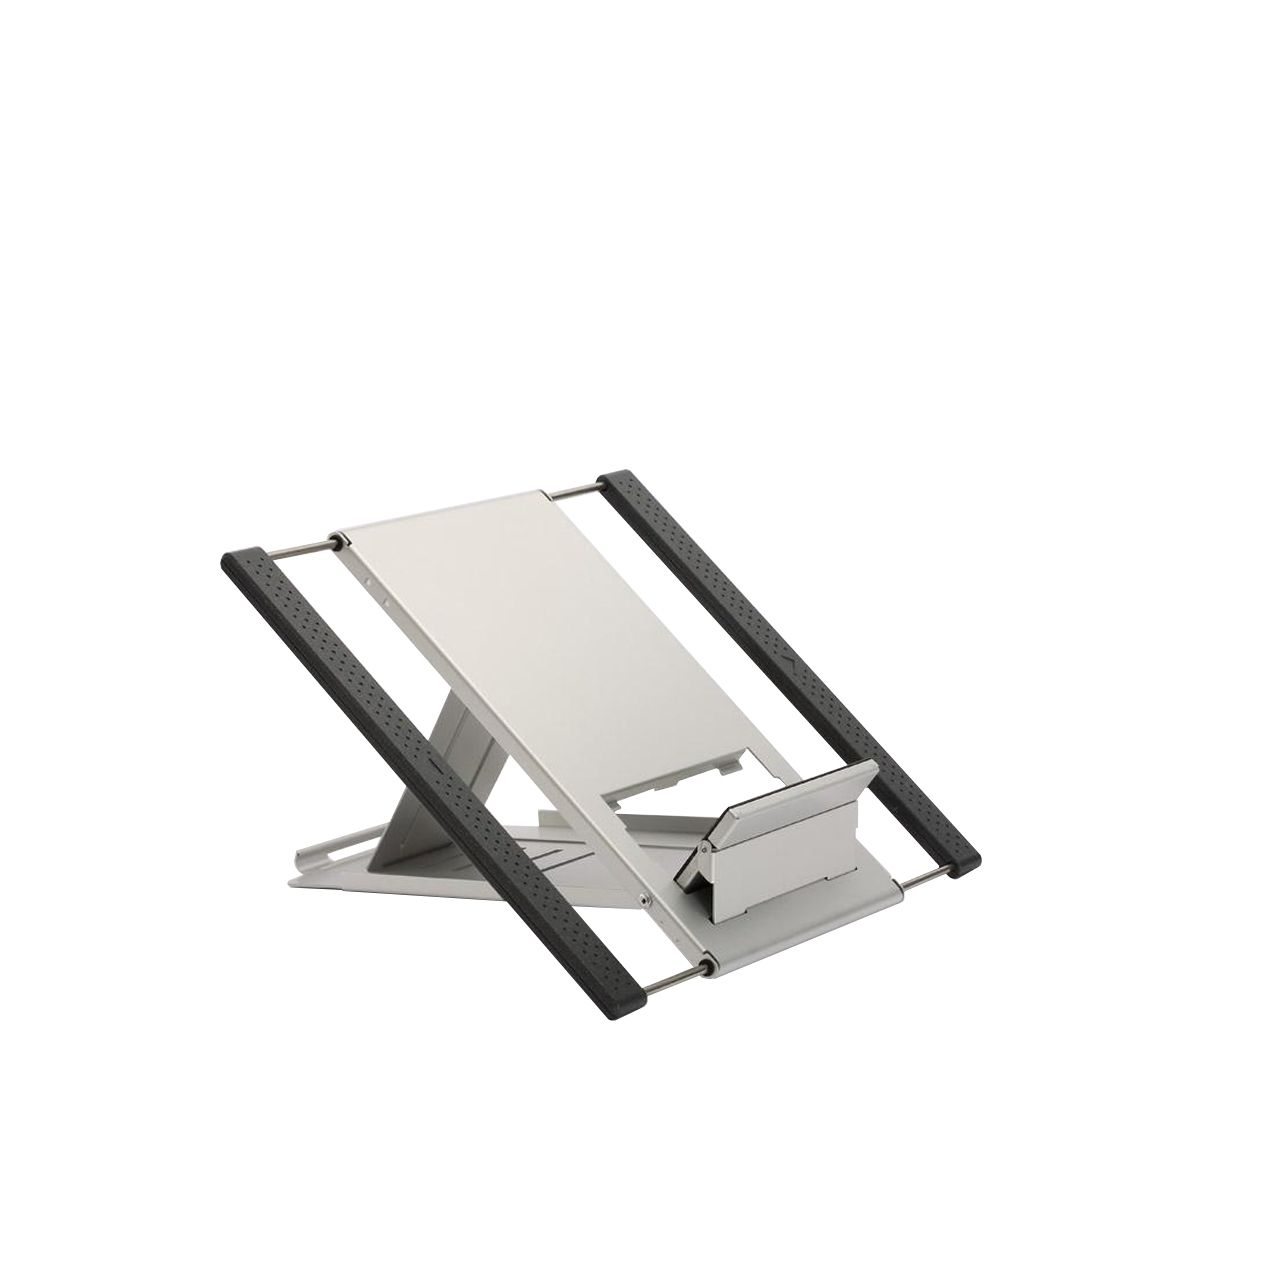 ergostar laptopstand flexible laptophouder ERKASC01 Schuinvoor